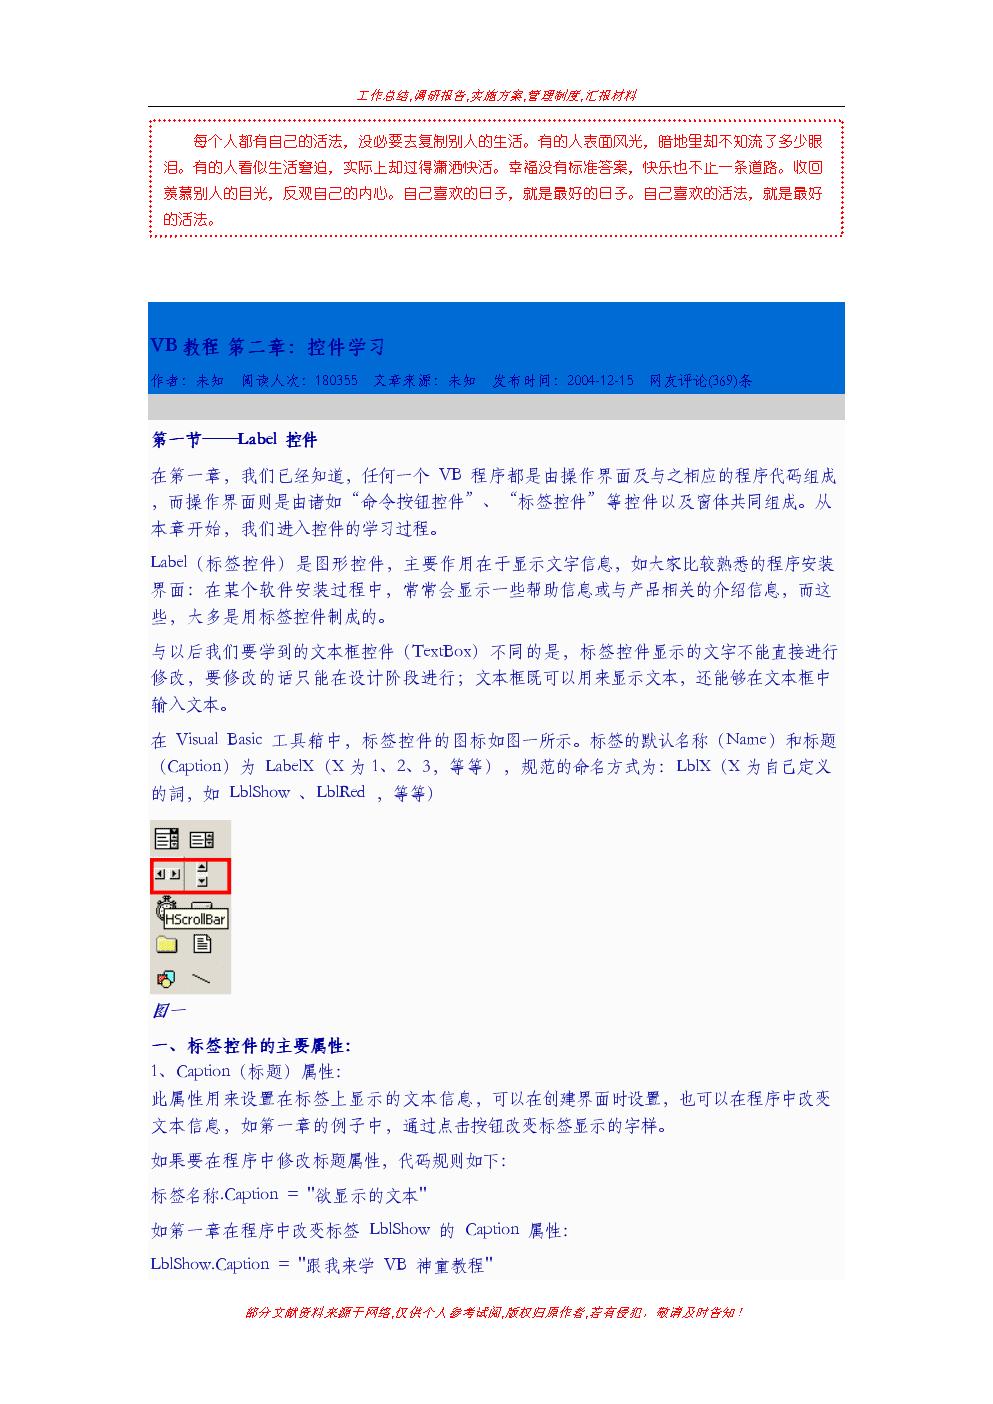 VB教程 第二章:控件学习.doc